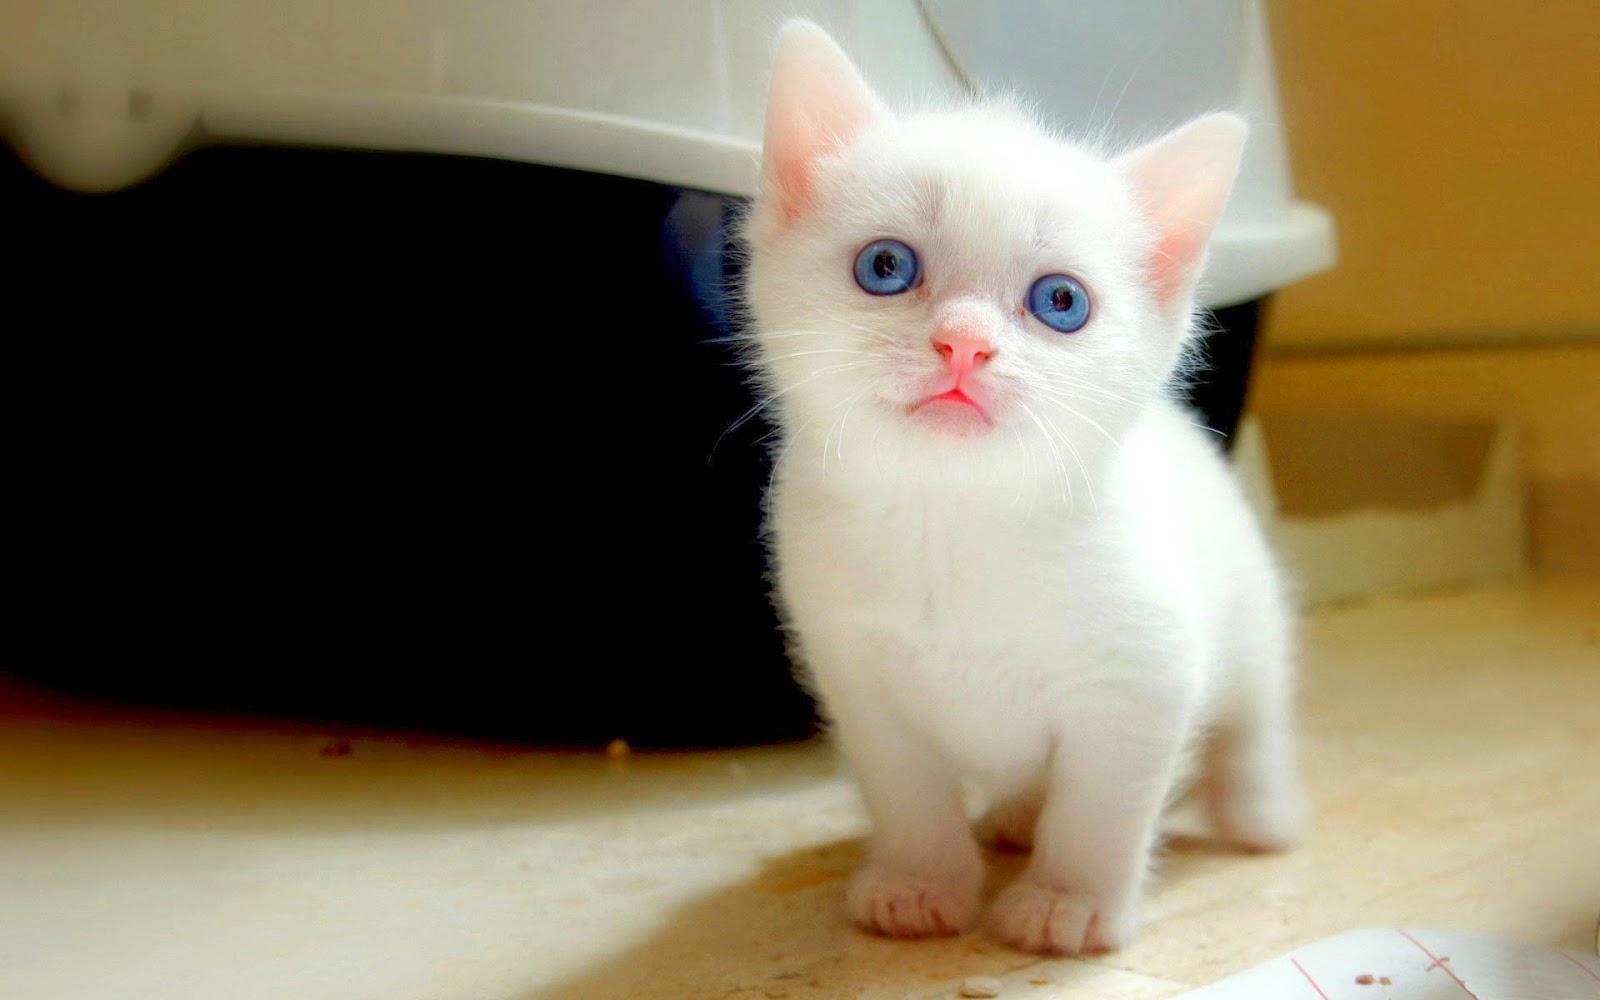 Cute Cat WallPapers Download Beautiful Cats Desktop HD 1600x1000